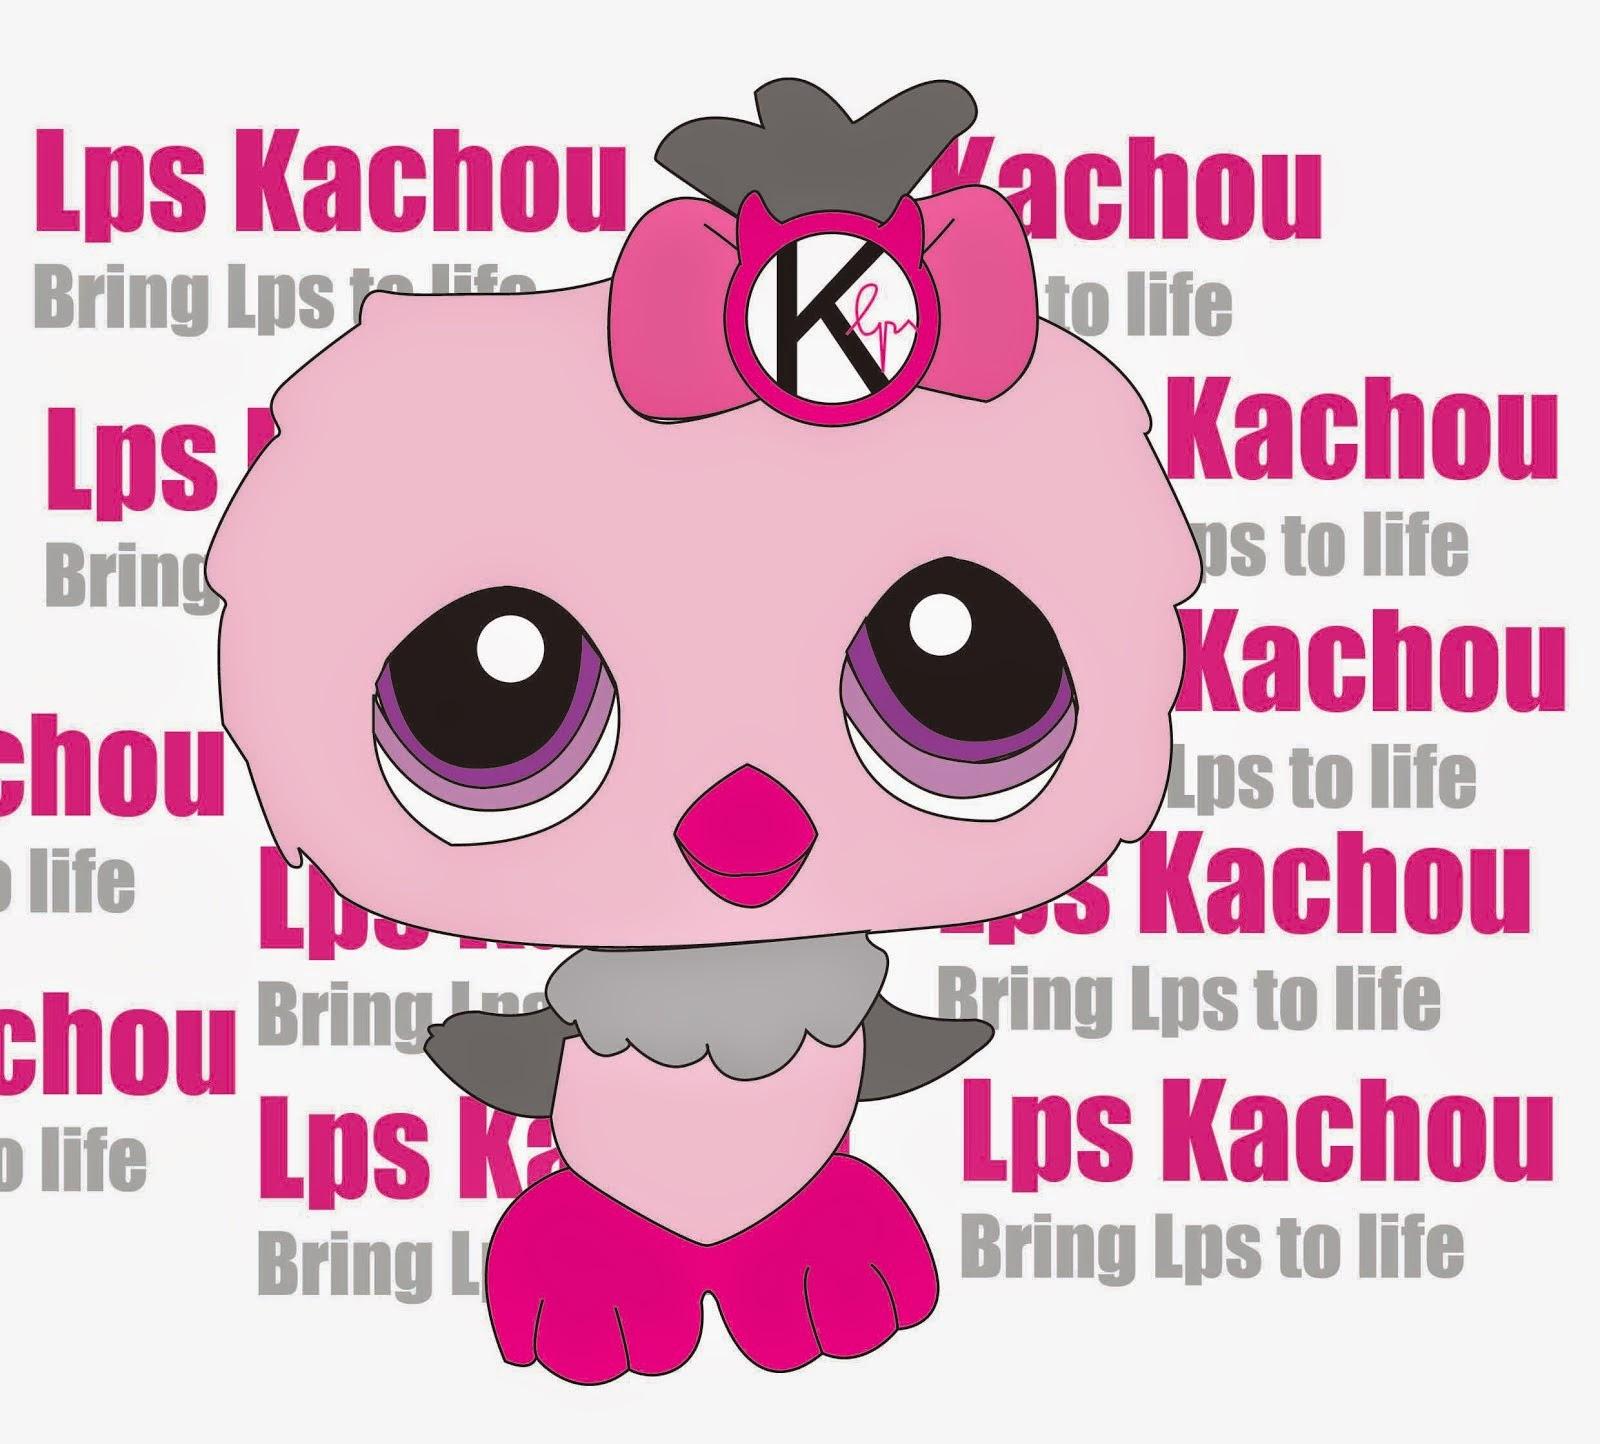 Lps Kachou